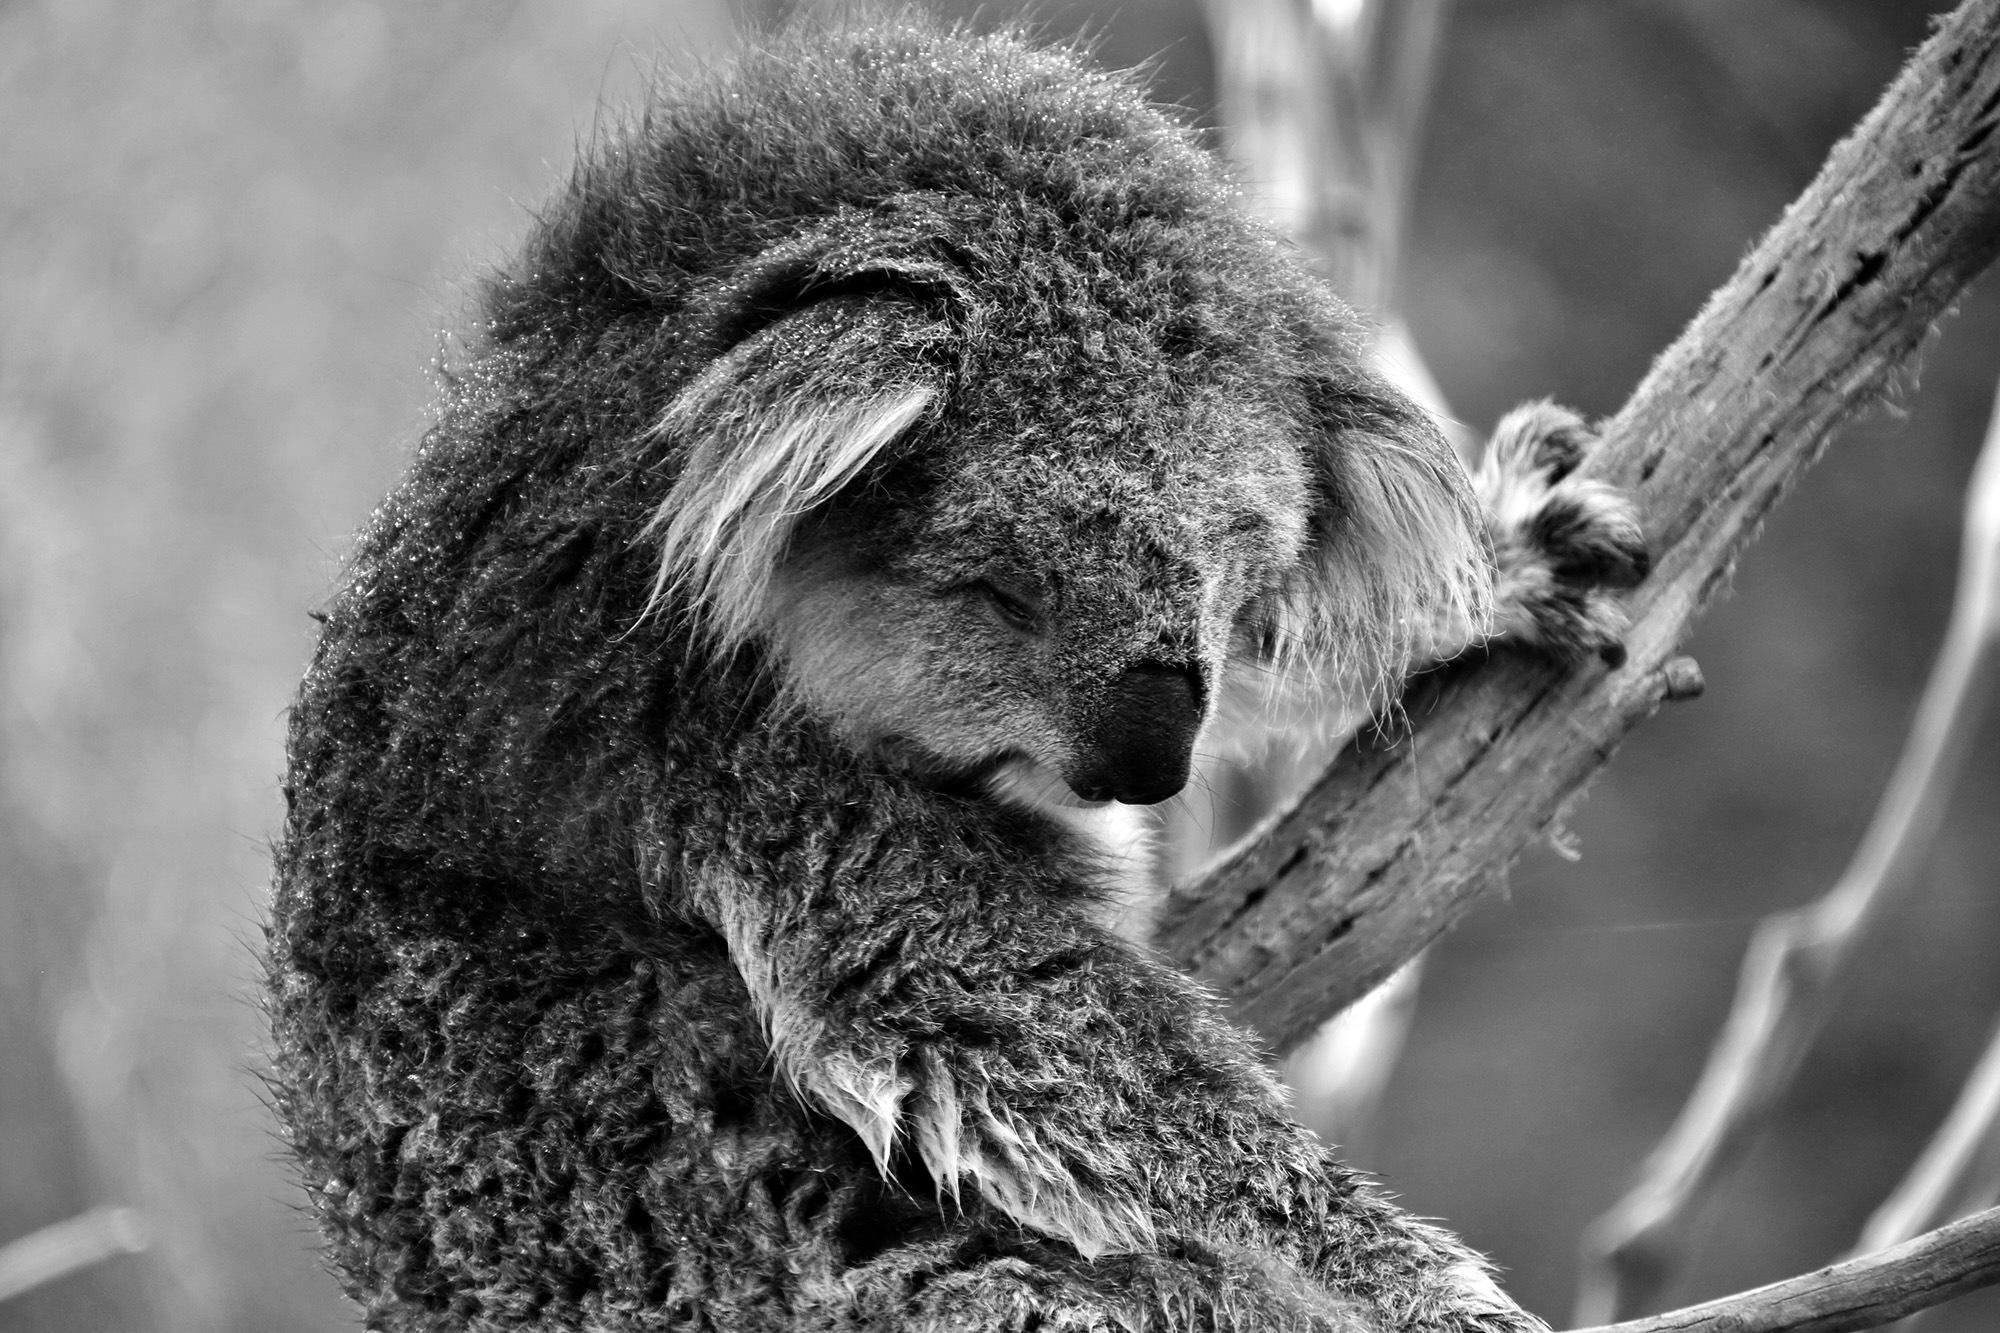 Koala by Andrea Papageorgiu